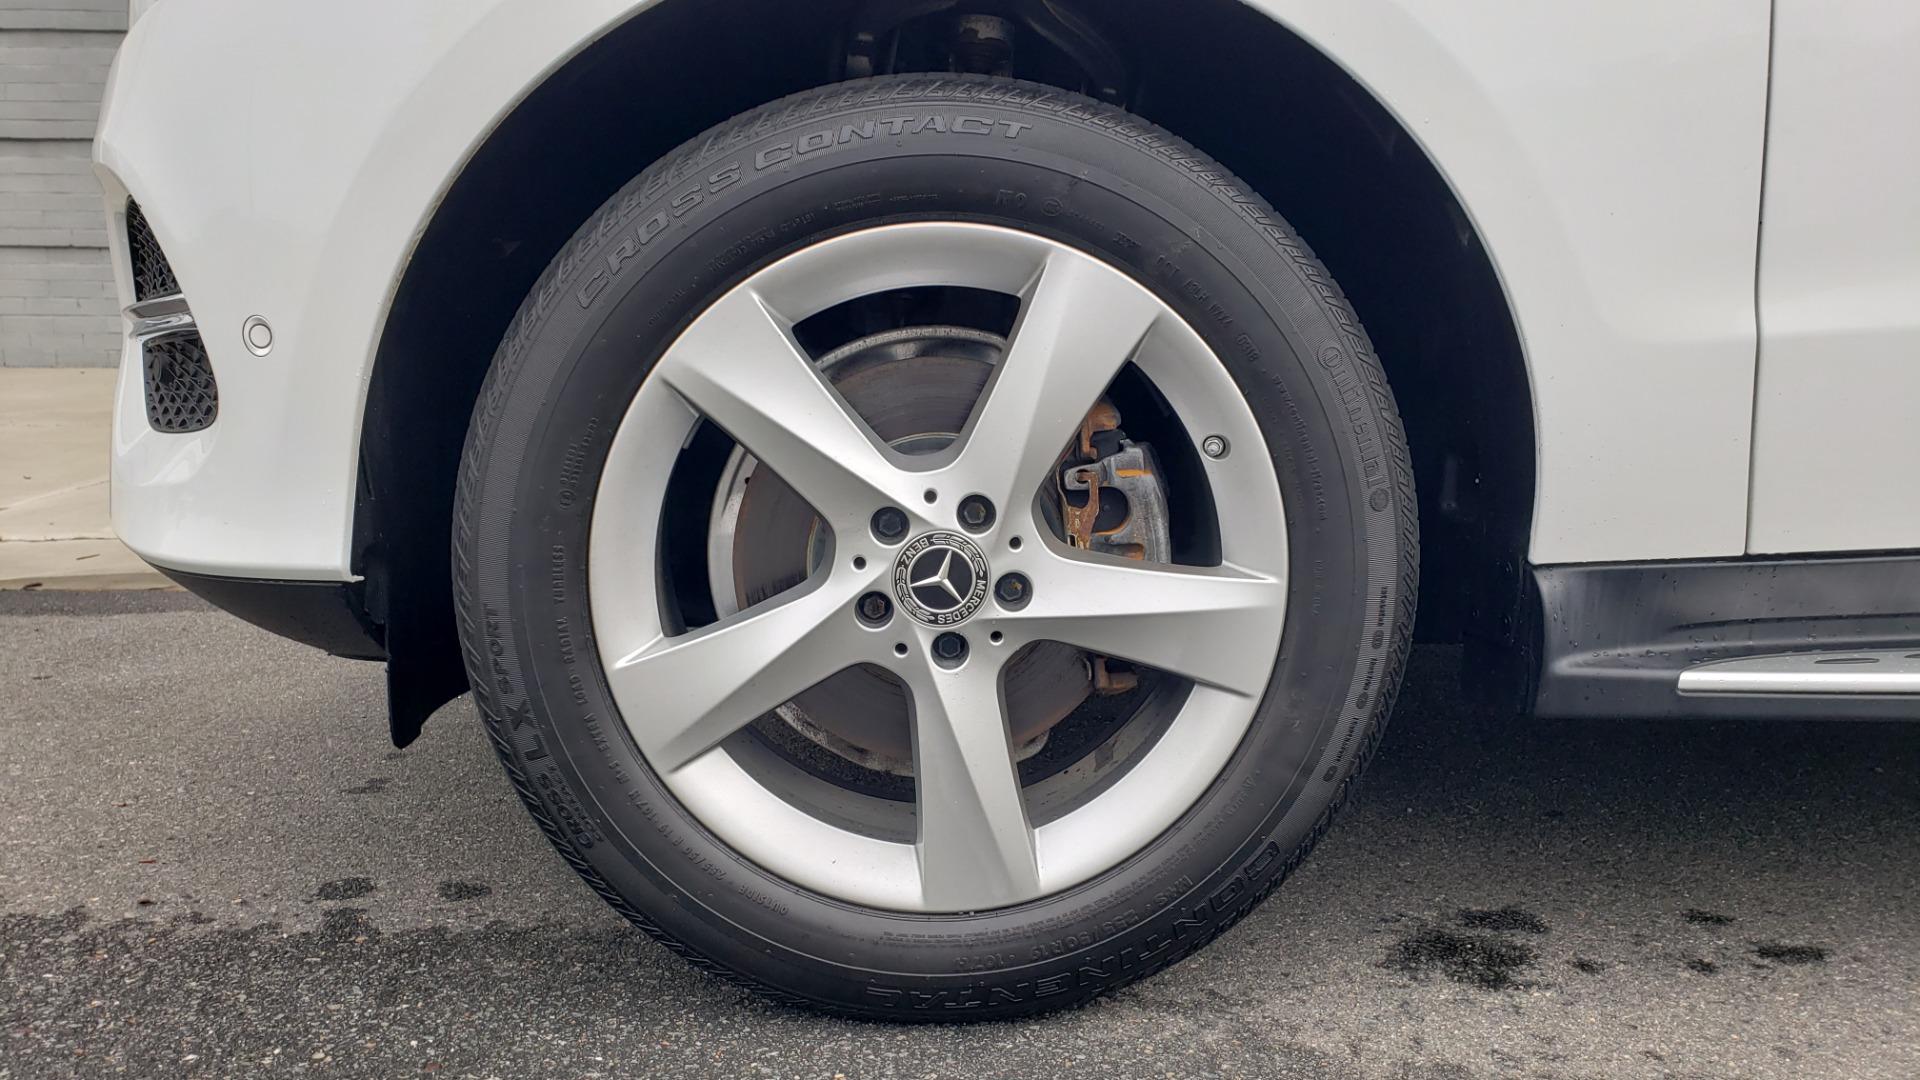 Used 2018 Mercedes-Benz GLE 350 4MATIC / PREM PKG / NAV / PARK ASST / K/H SND / HITCH / REARVIEW for sale $40,801 at Formula Imports in Charlotte NC 28227 82